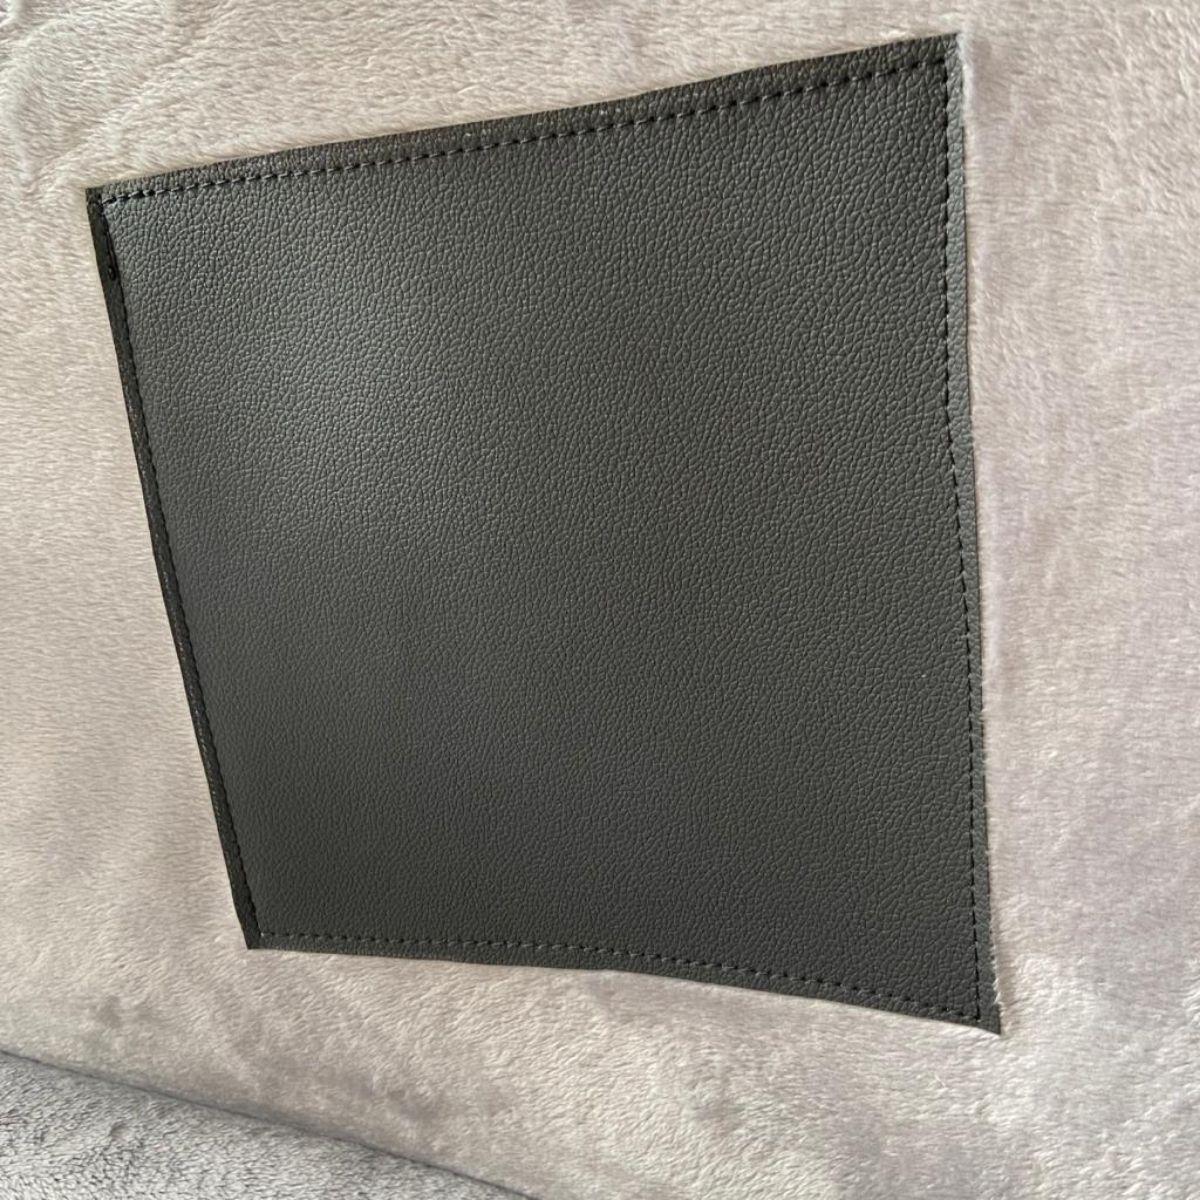 Capa Semi Case para Contra Baixo Premium Soft Case